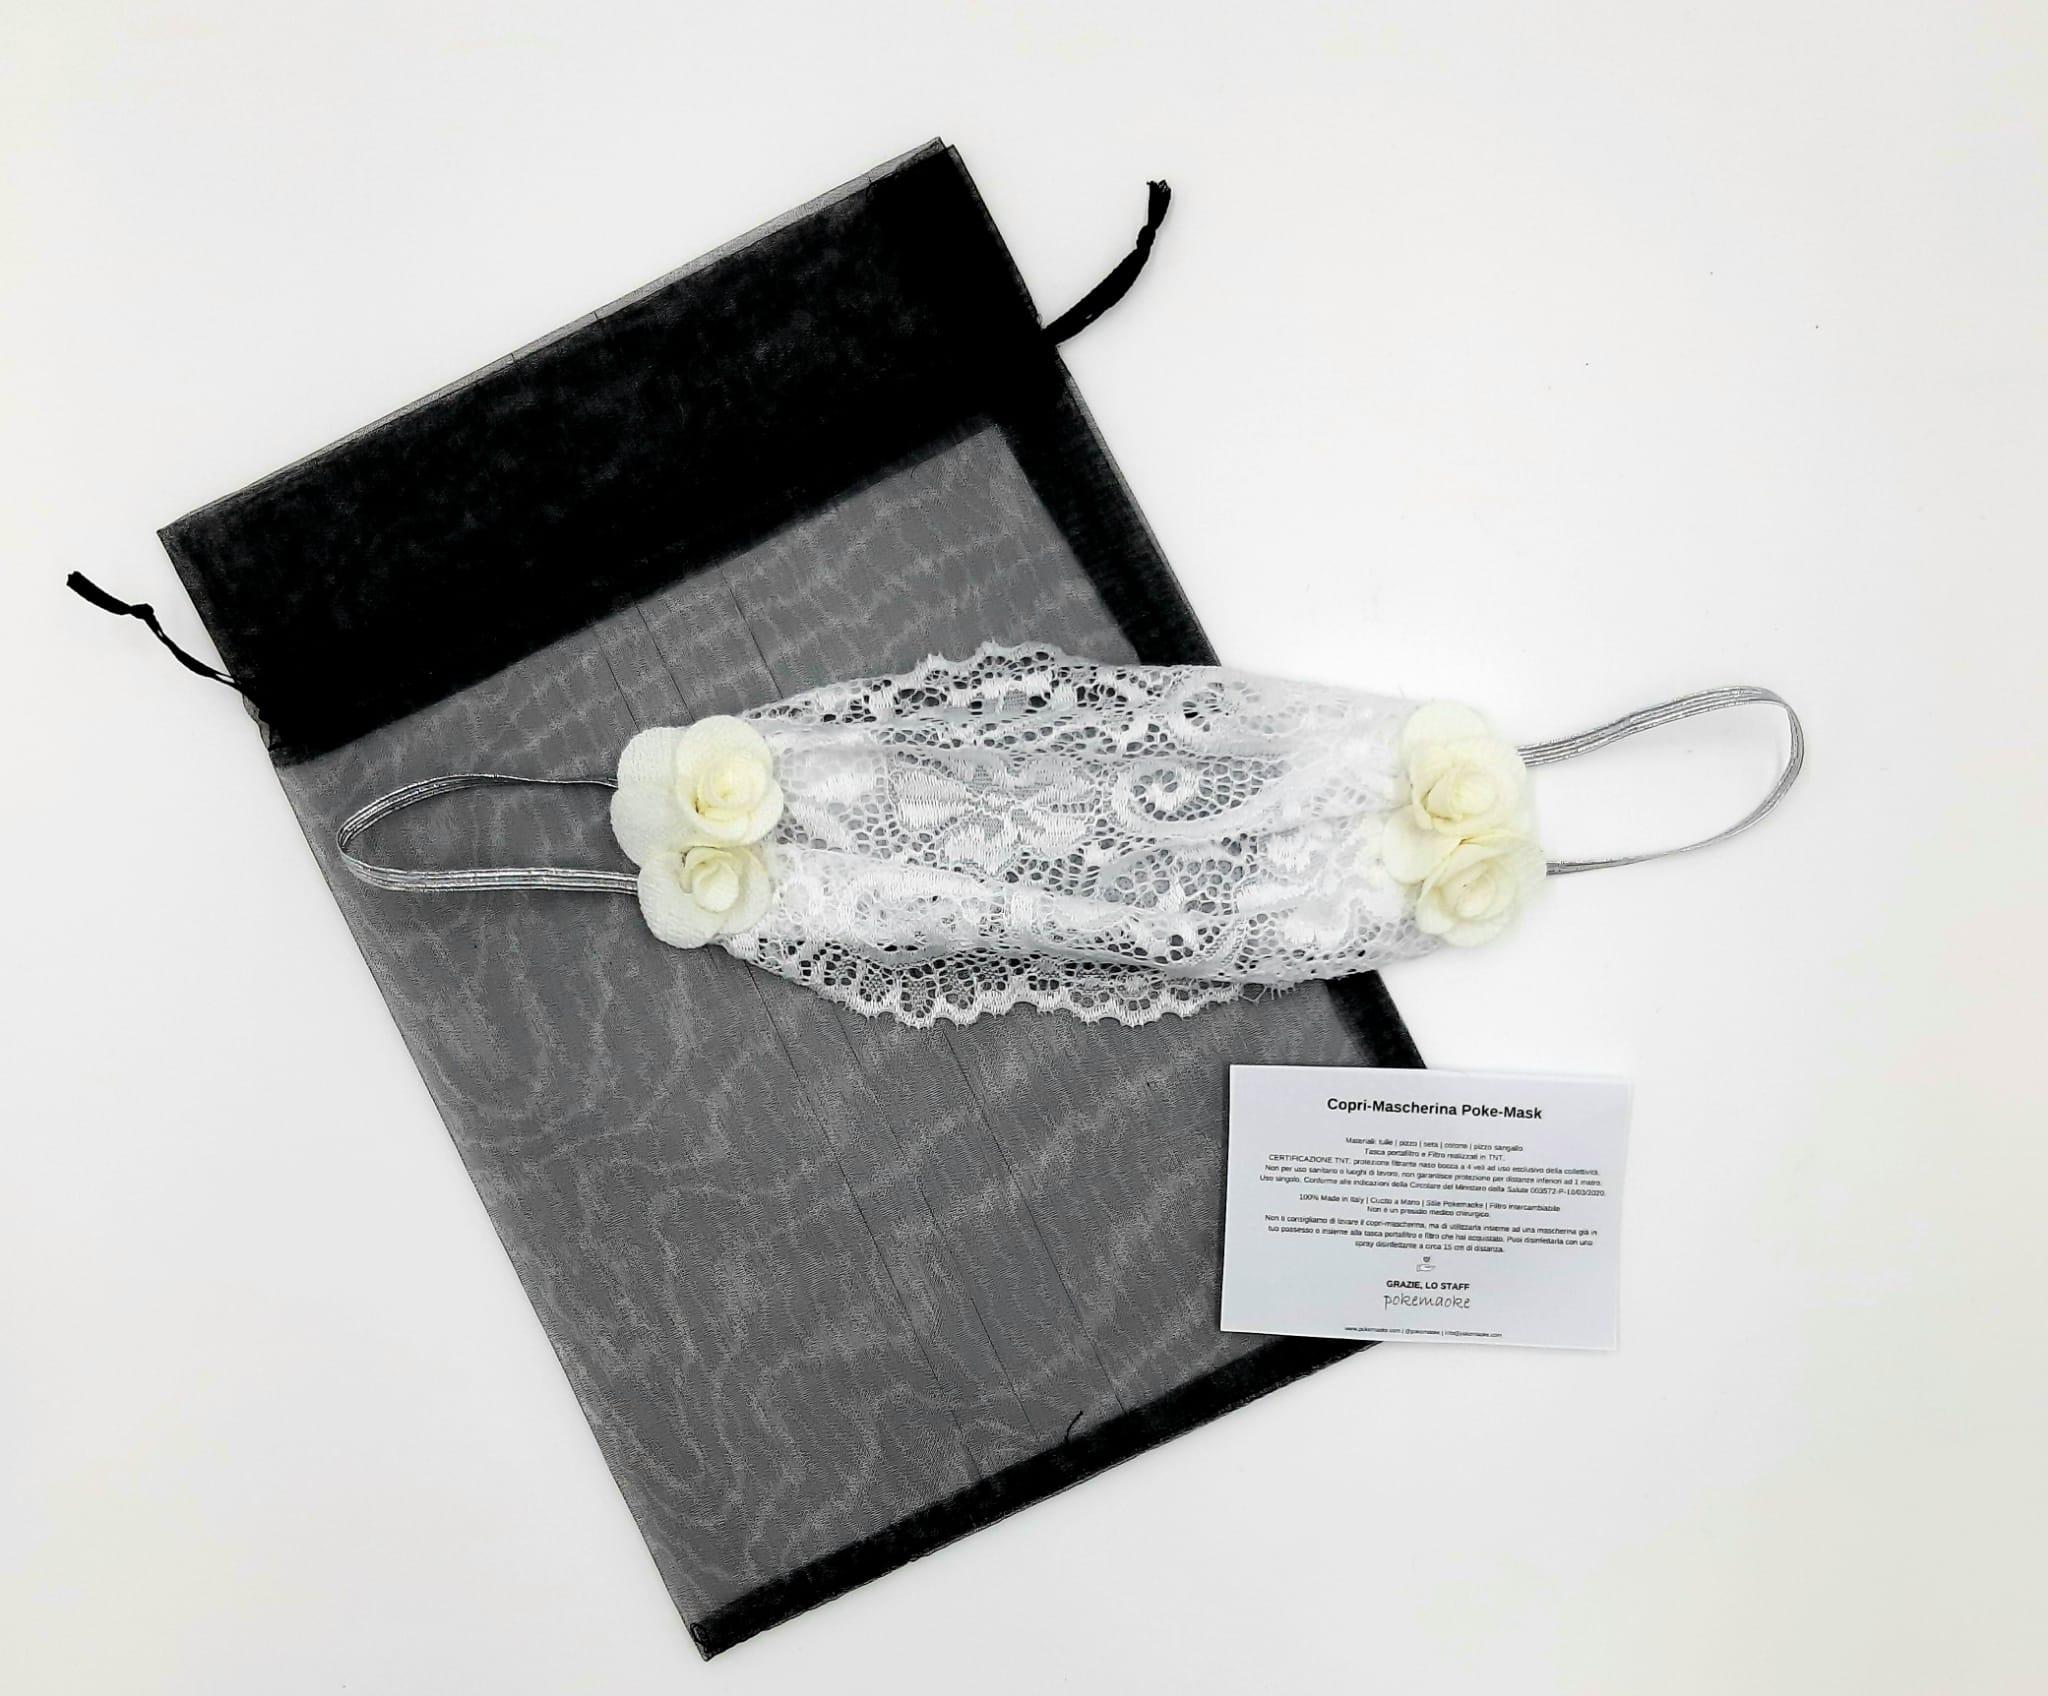 Mascherina bianca con applicazione rose Pokemaoke